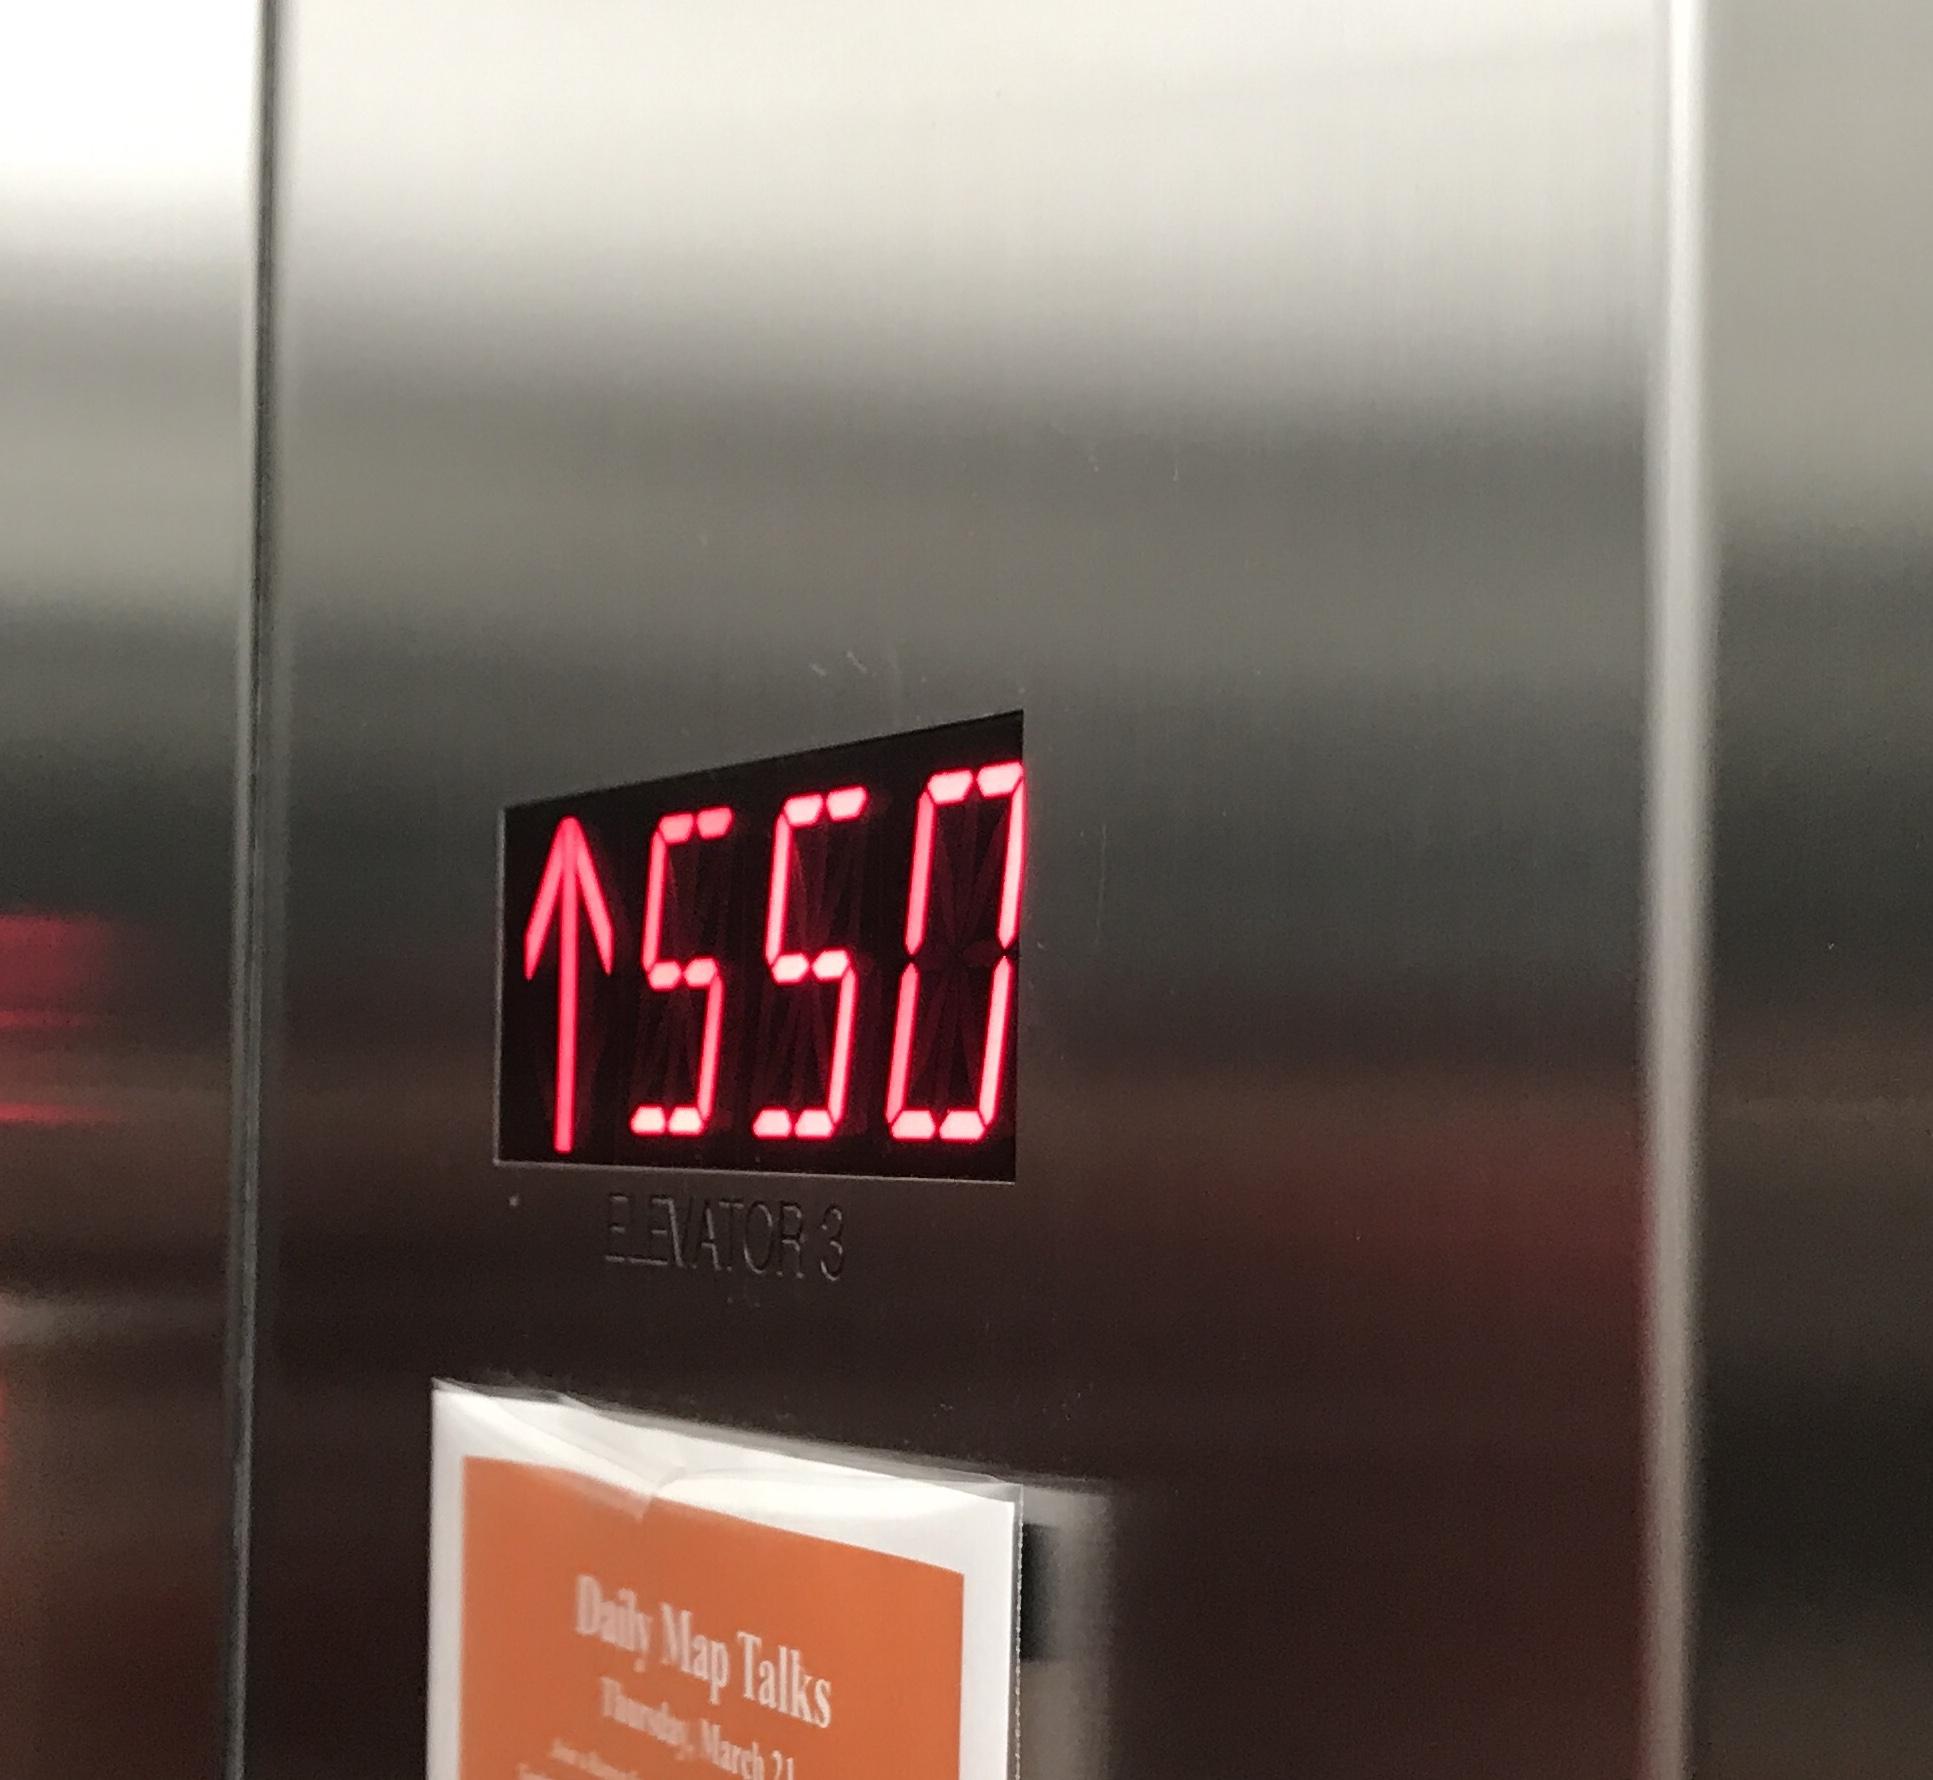 Elevator counts feet not floors